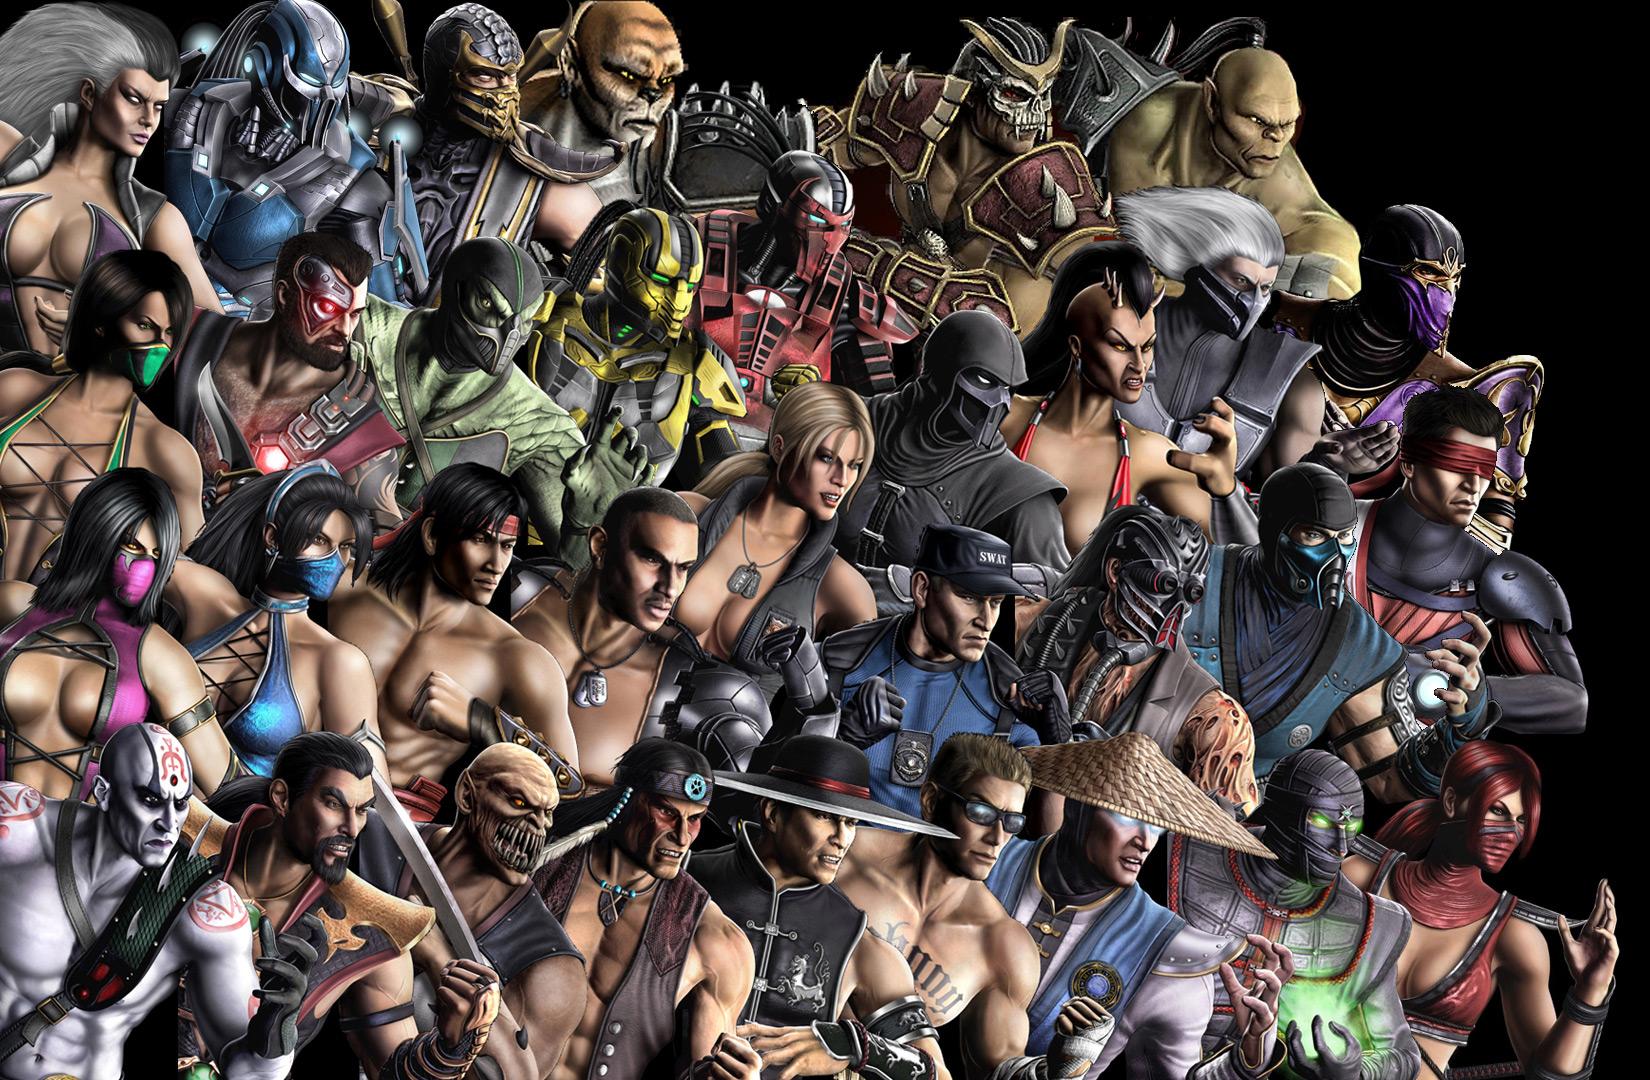 For its 25th anniversary, Destructoid names the top 10 Mortal Kombat kharacters screenshot